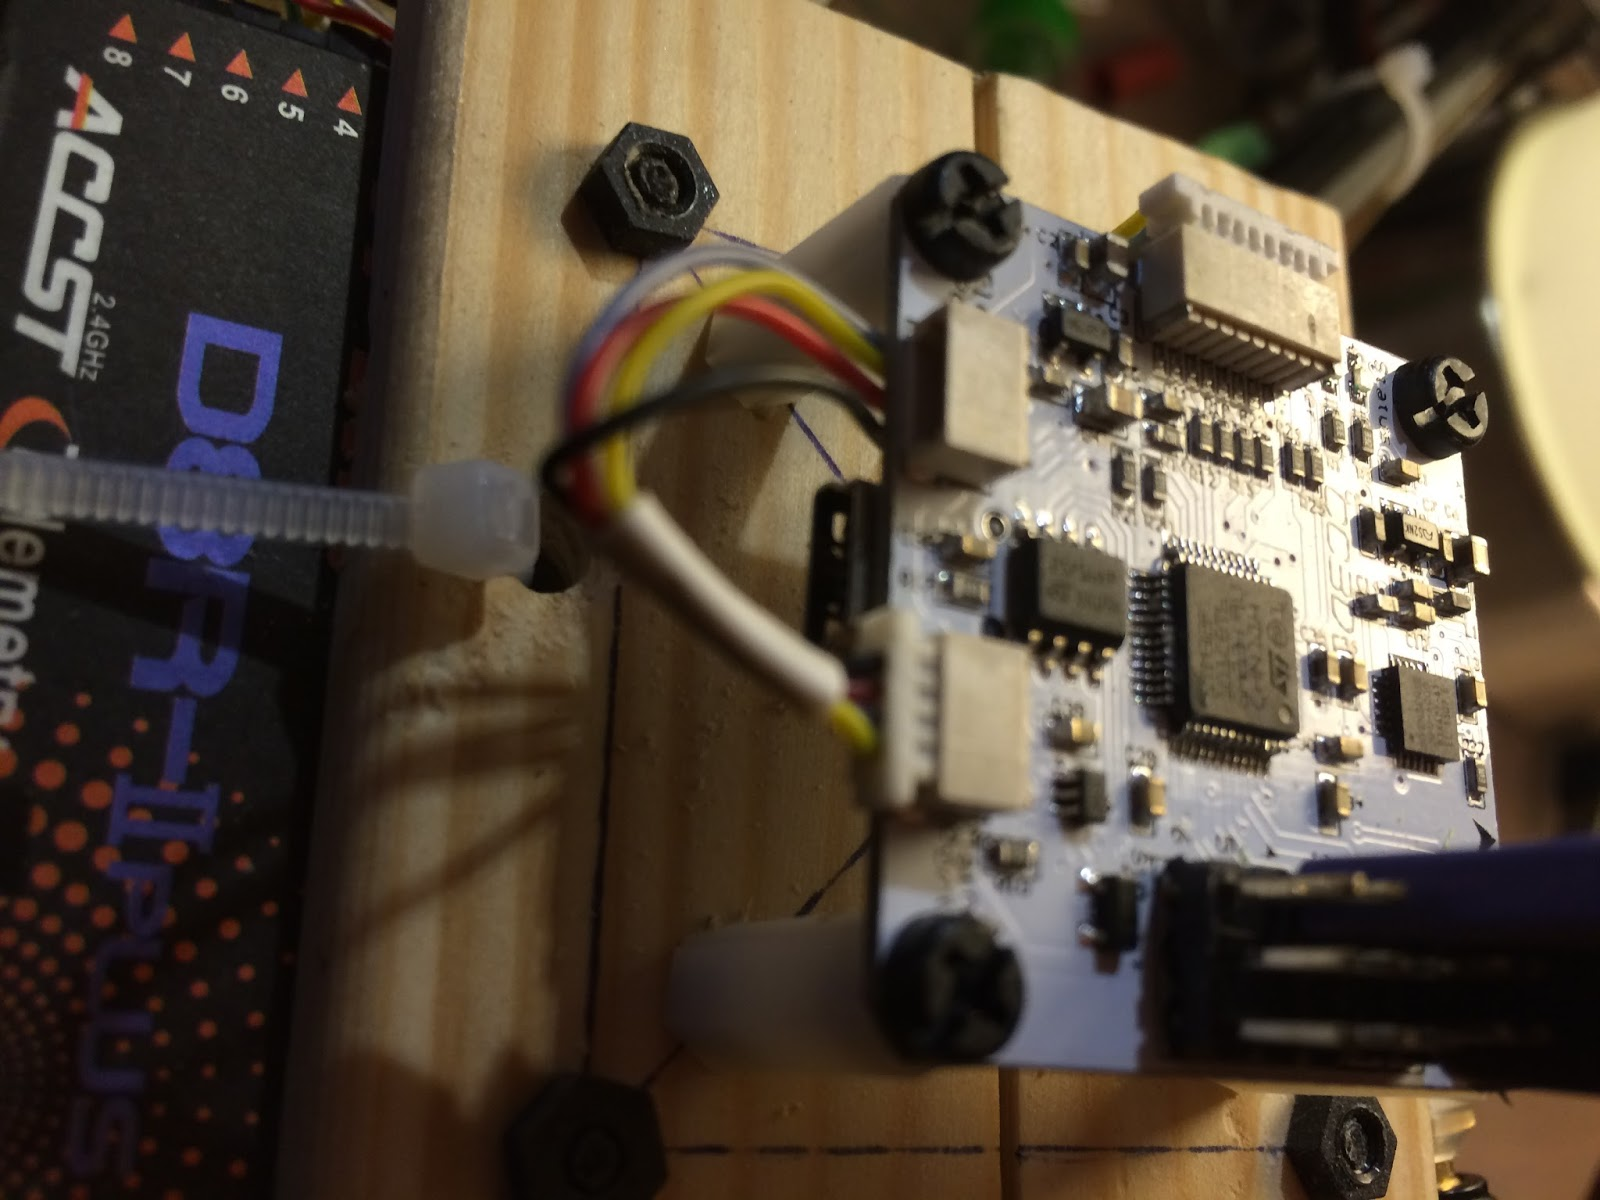 WRG-0721] Telemetry Cc3d Wiring Diagram on